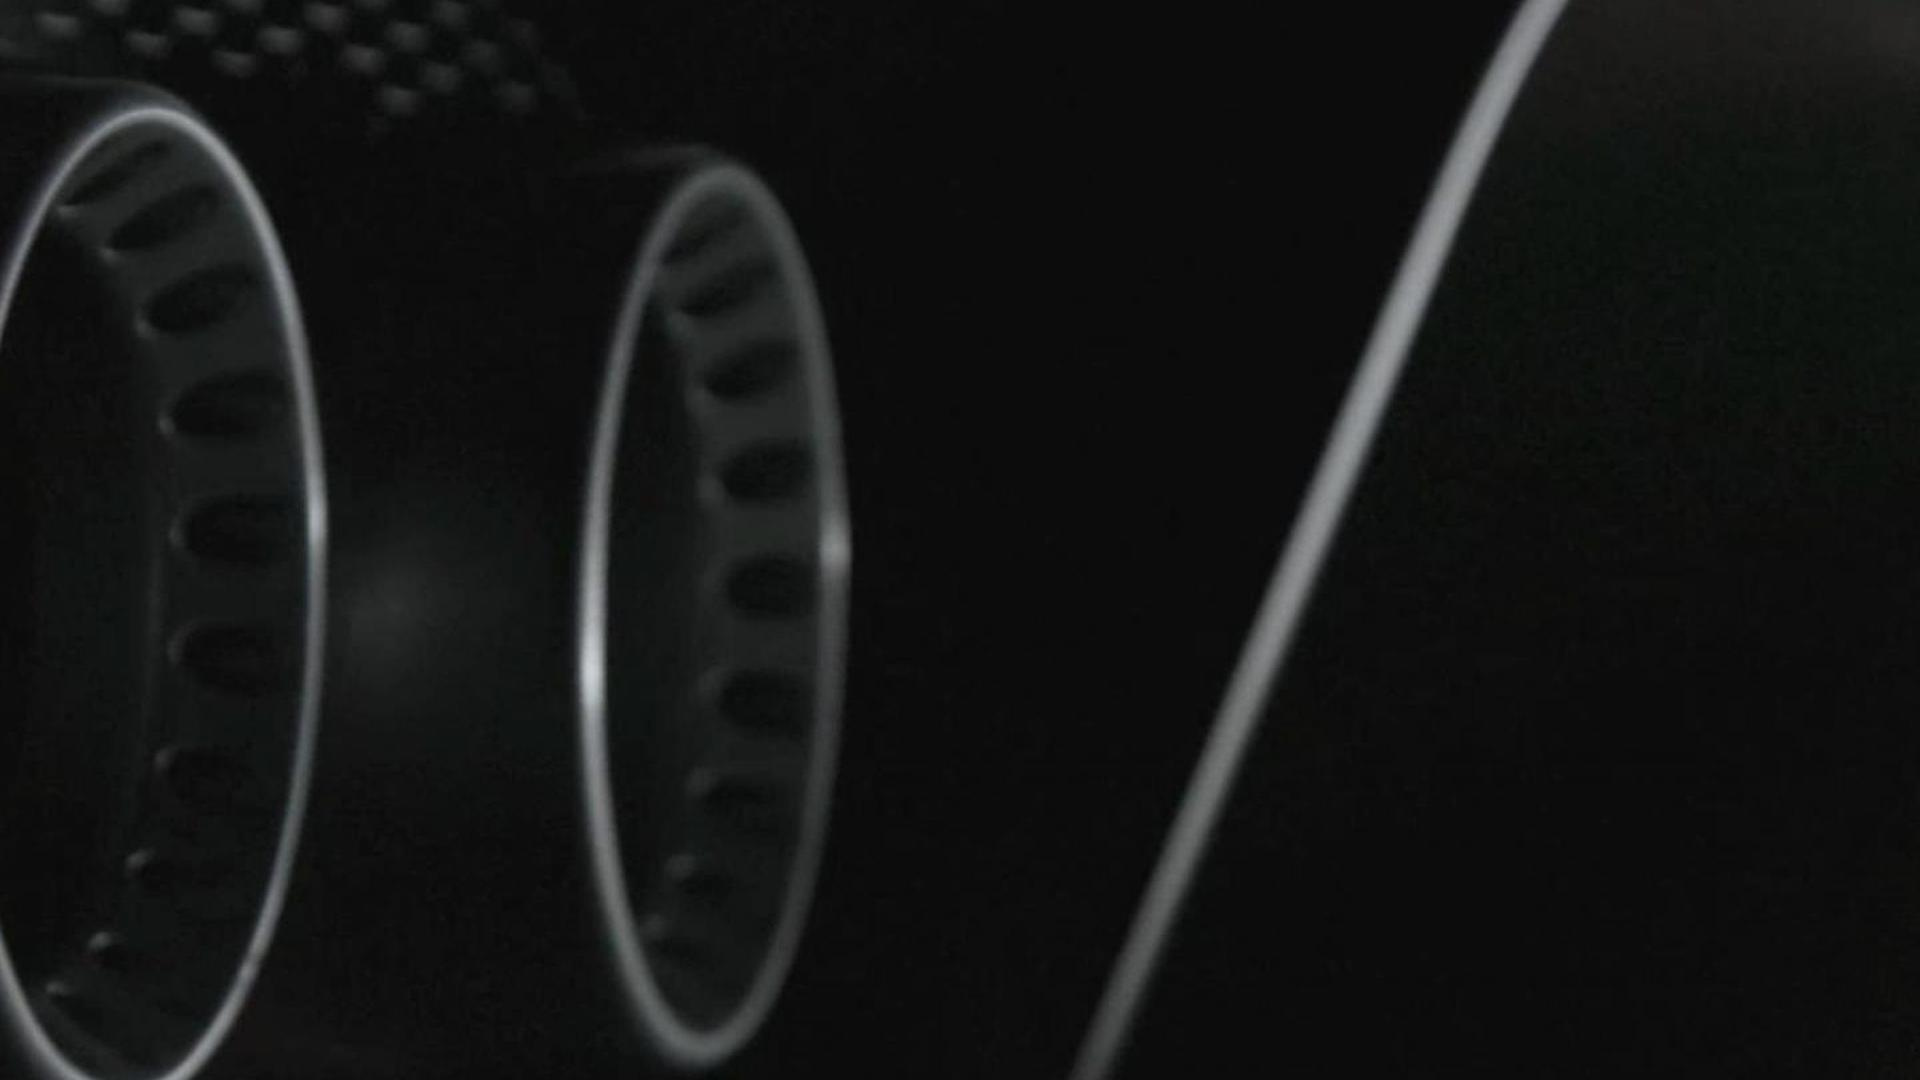 2013 ferrari f70 white gallery hd cars wallpaper 2013 ferrari f70 white choice image hd cars wallpaper 2013 ferrari f70 red images hd cars wallpaper 2013 ferrari f70 white choice image hd cars vanachro vanachro Choice Image